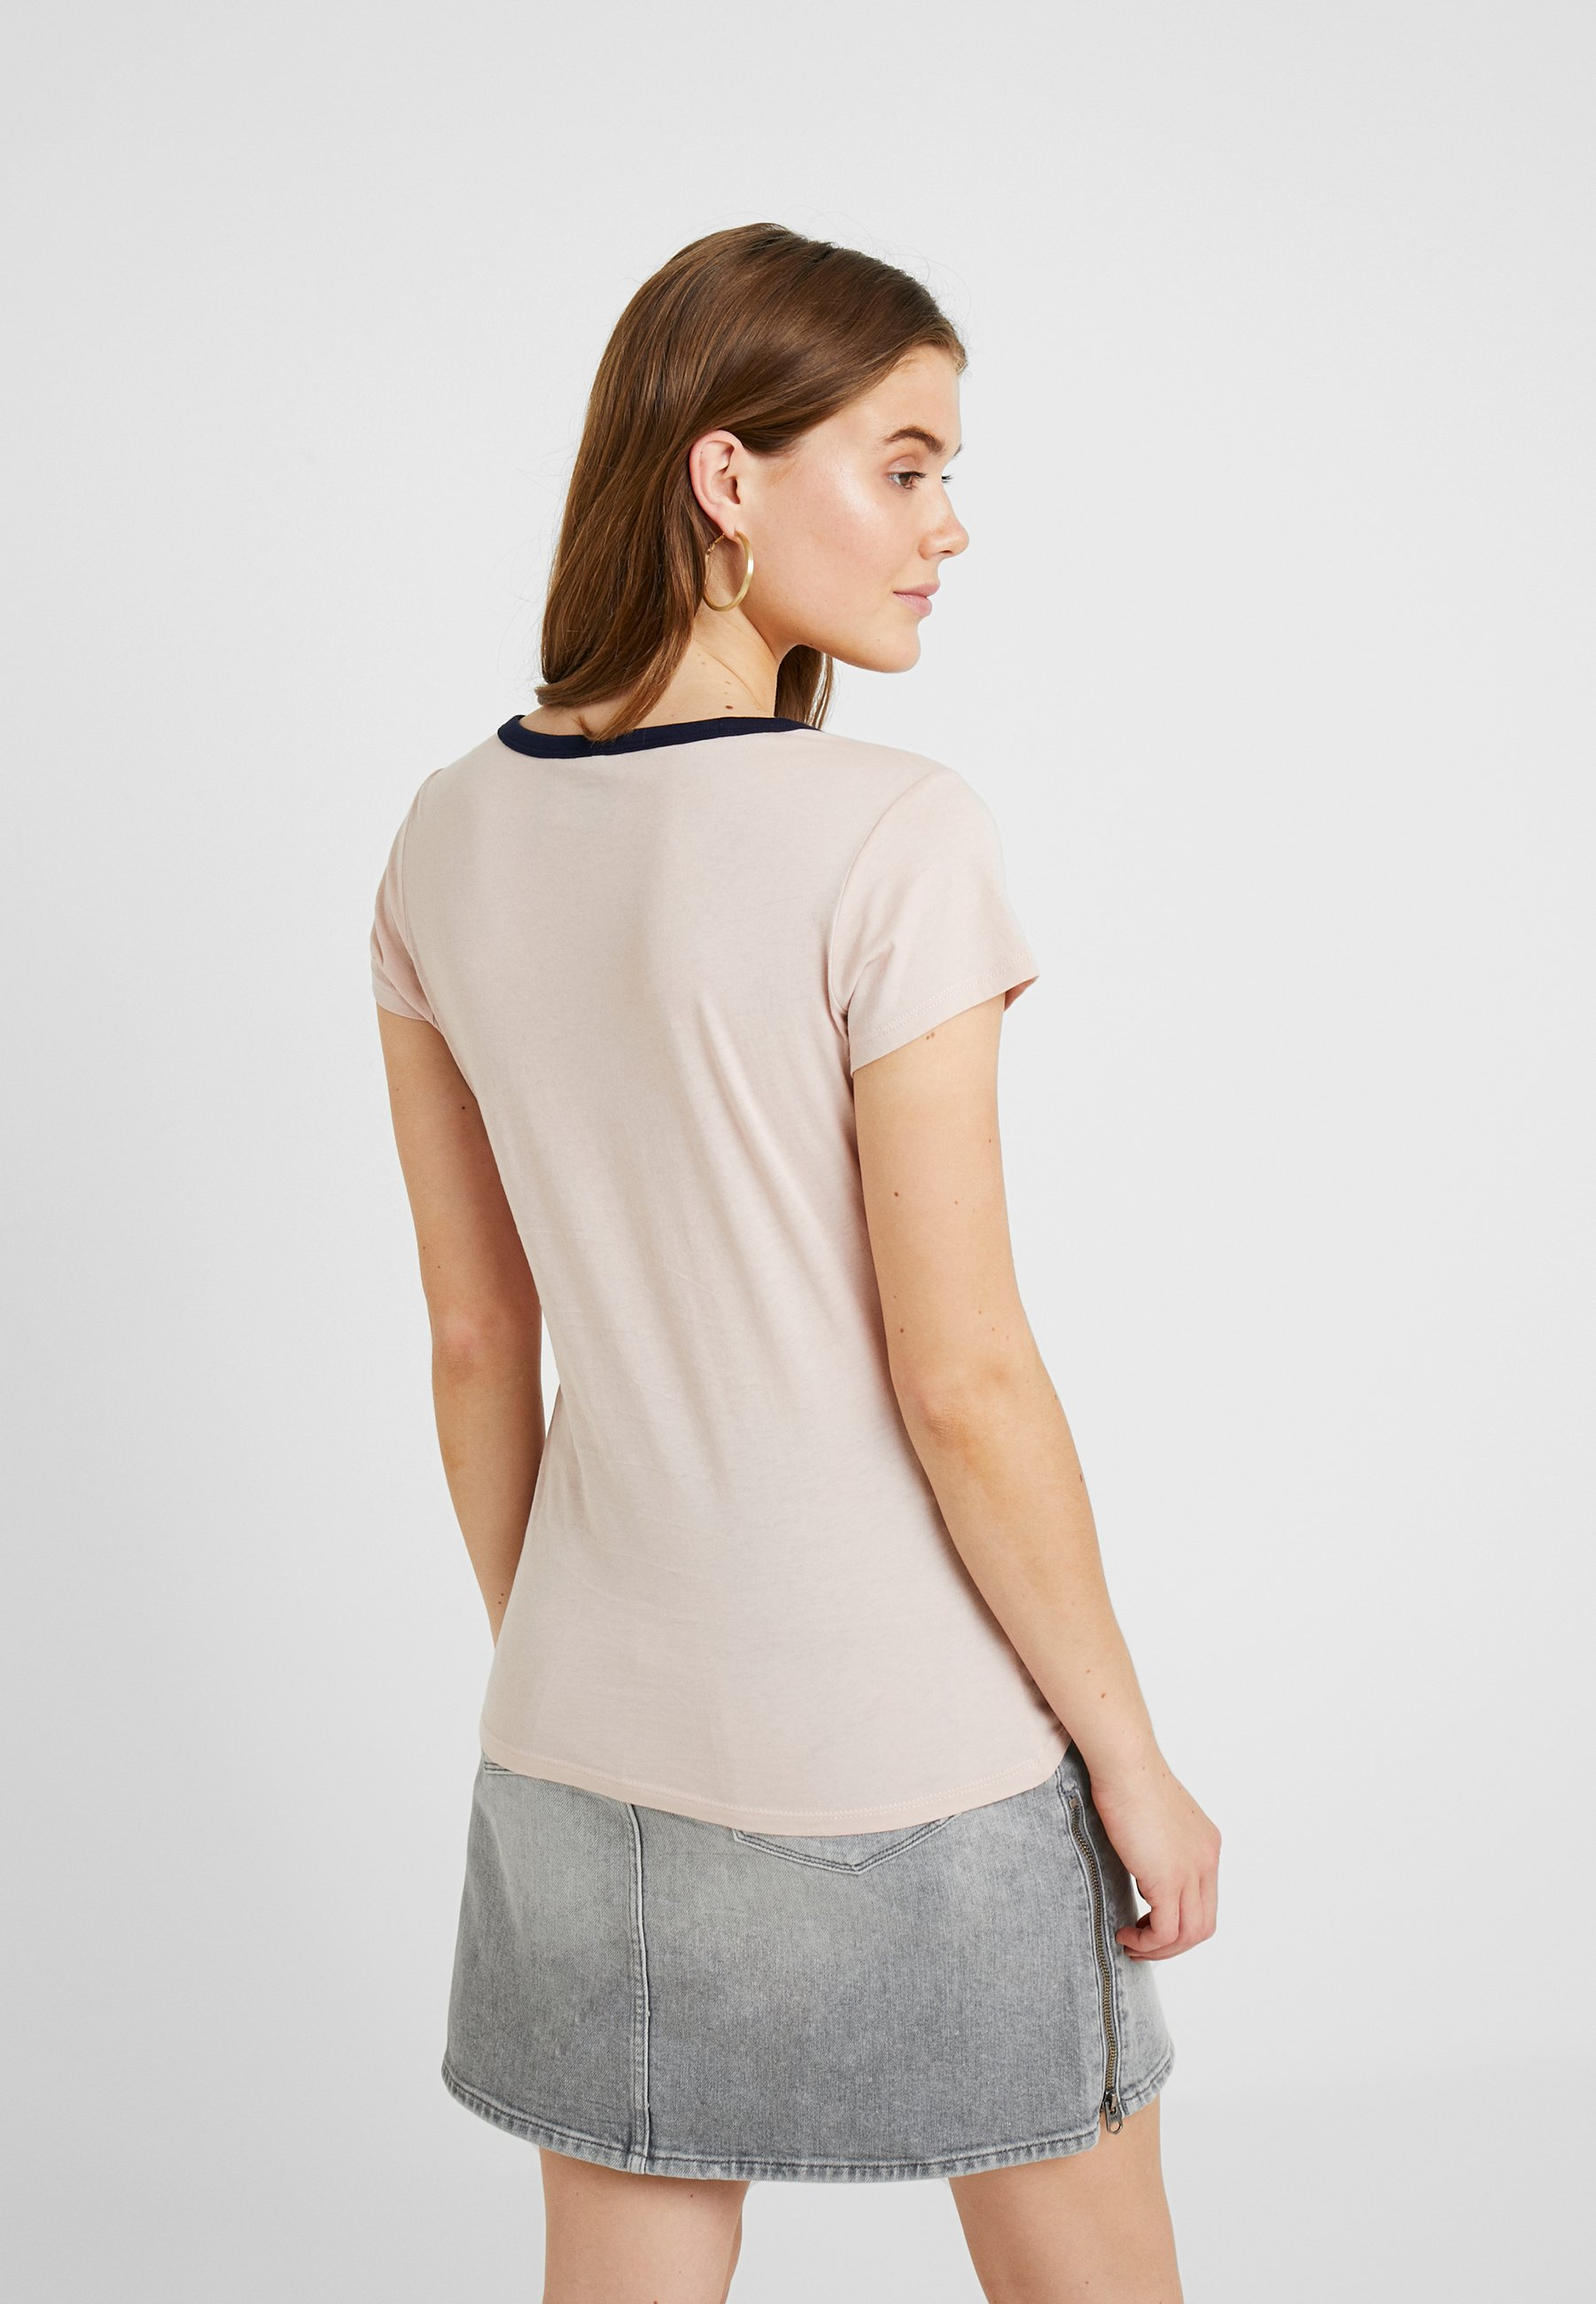 shirt R G star sT Wmn 27 Slim S Imprimé Light Pink T Graphic P8nkX0ONw